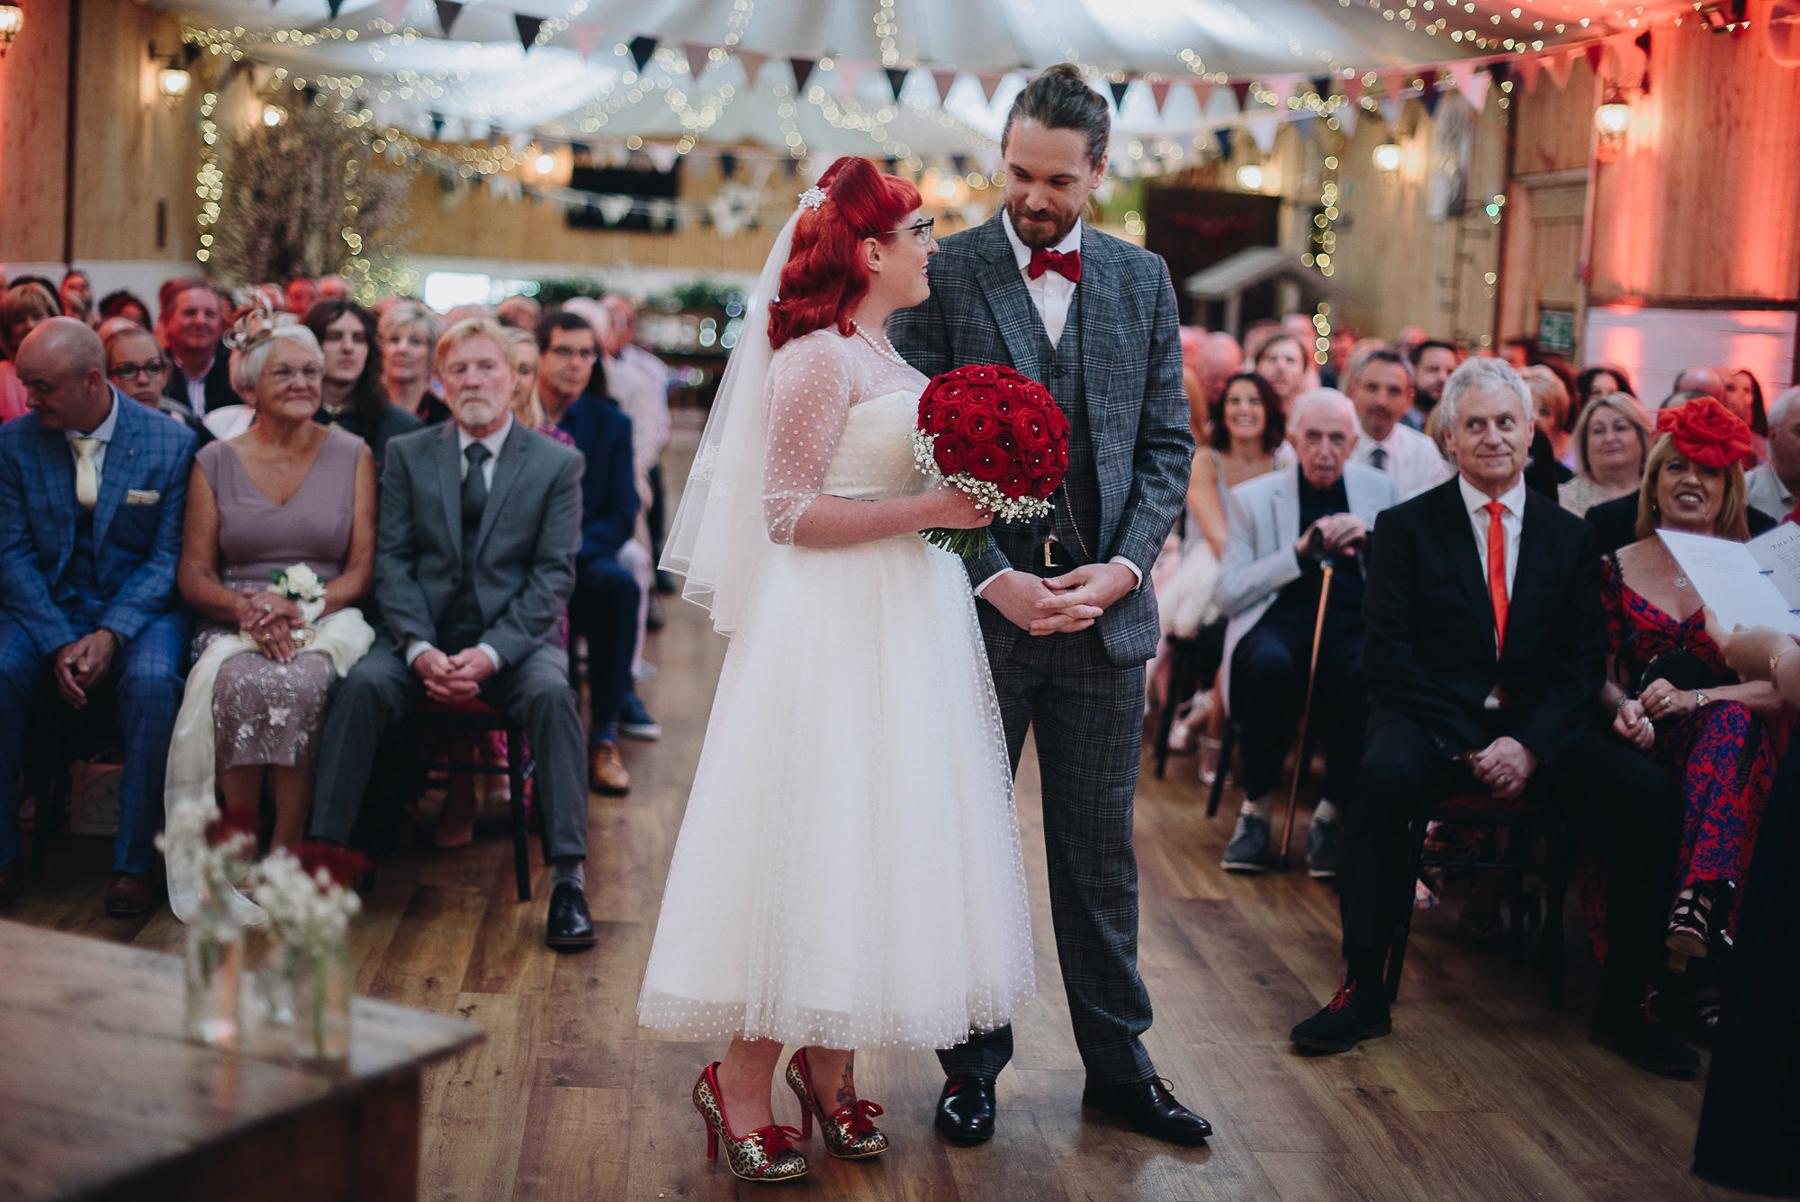 Wellbeing_Farm_Wedding_Photography_The_Pin-Up_Bride_Lara_Shaun-54.jpg